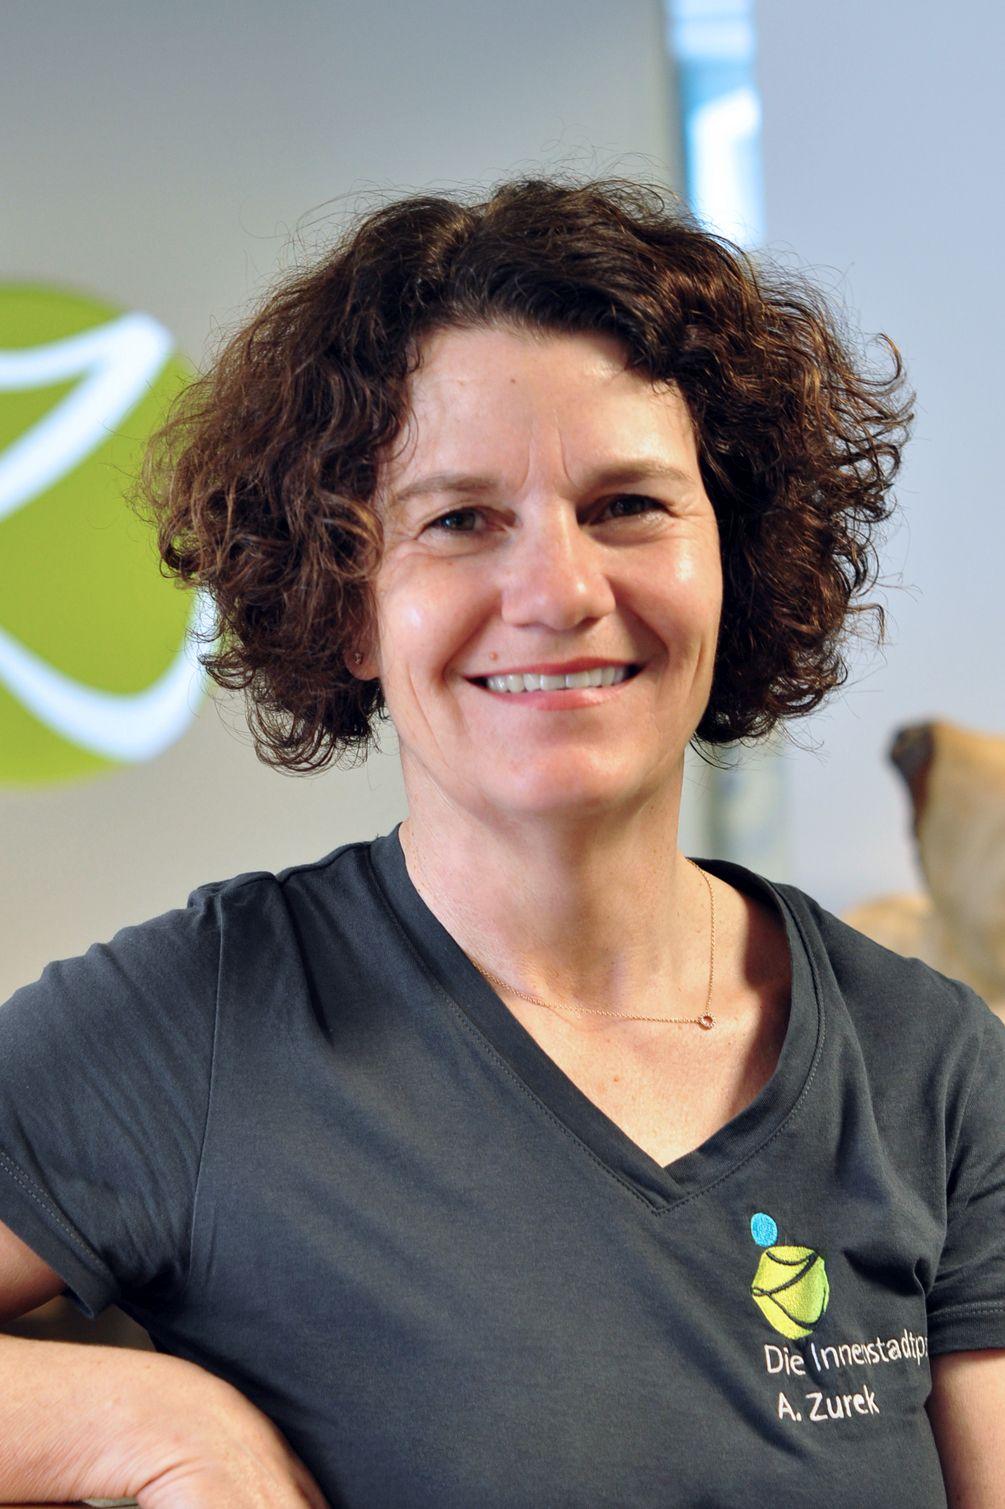 Andrea Zurek